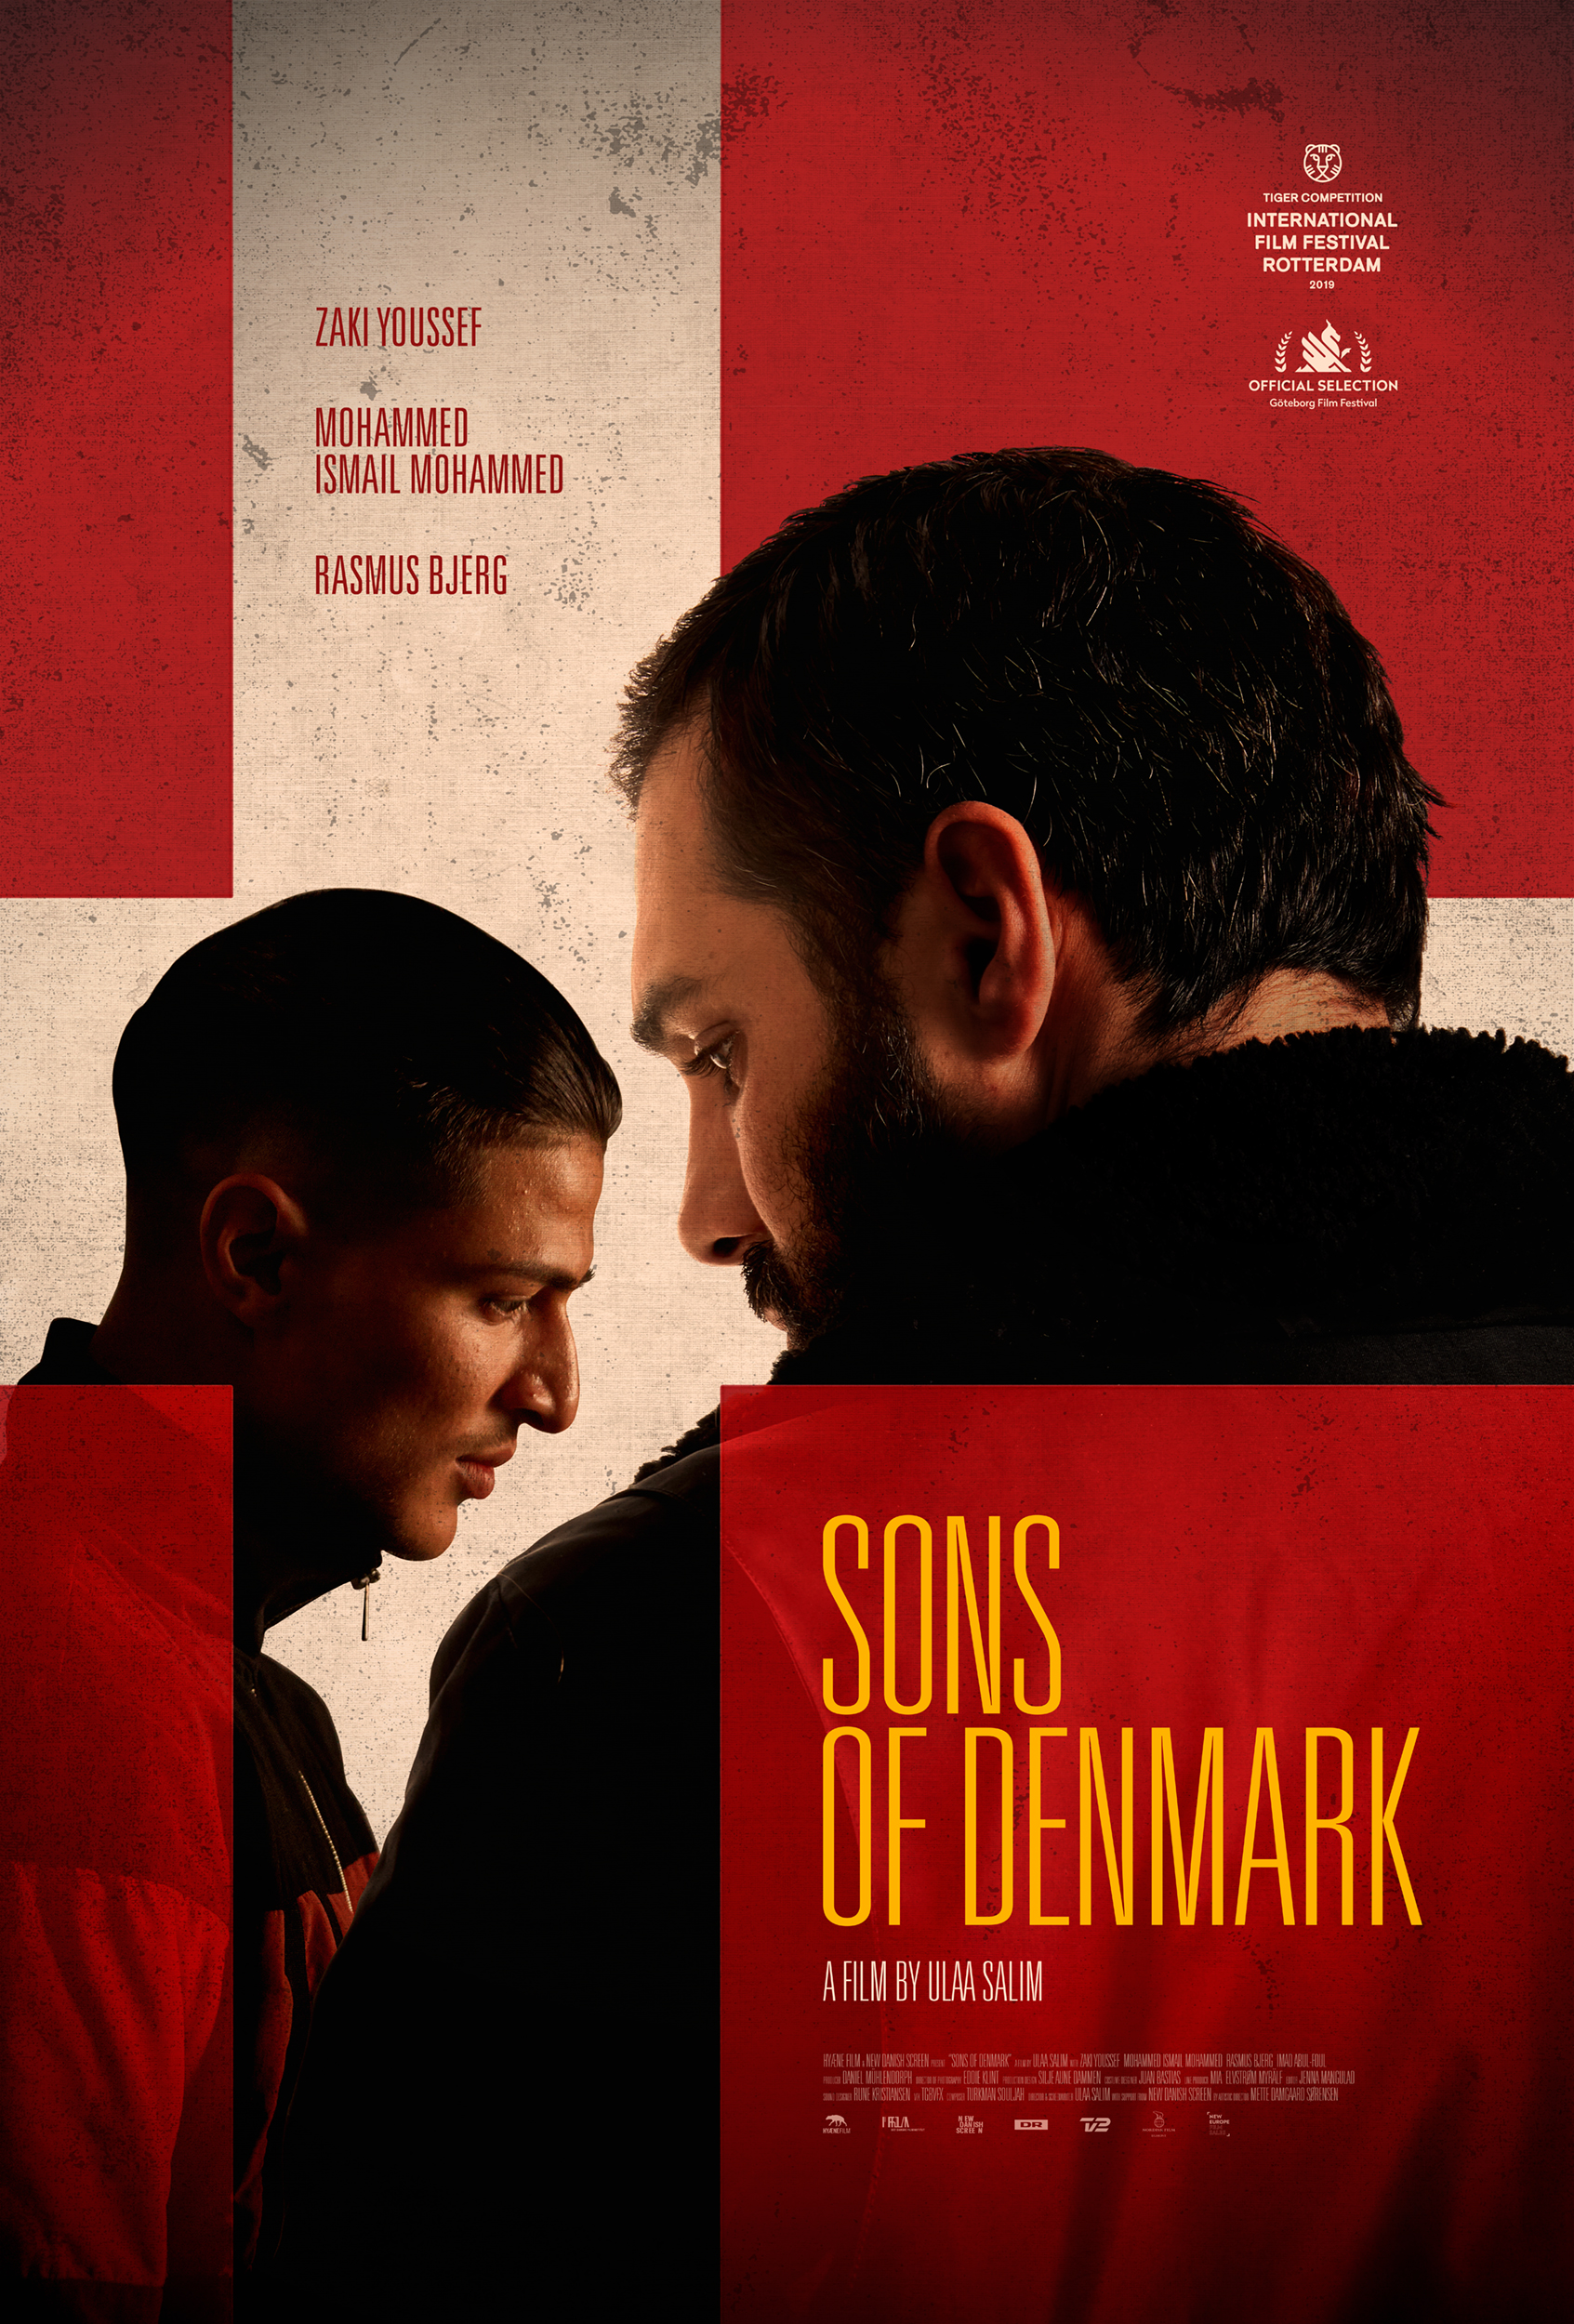 DANIJOS SŪNŪS (2019) / Danmarks sønner